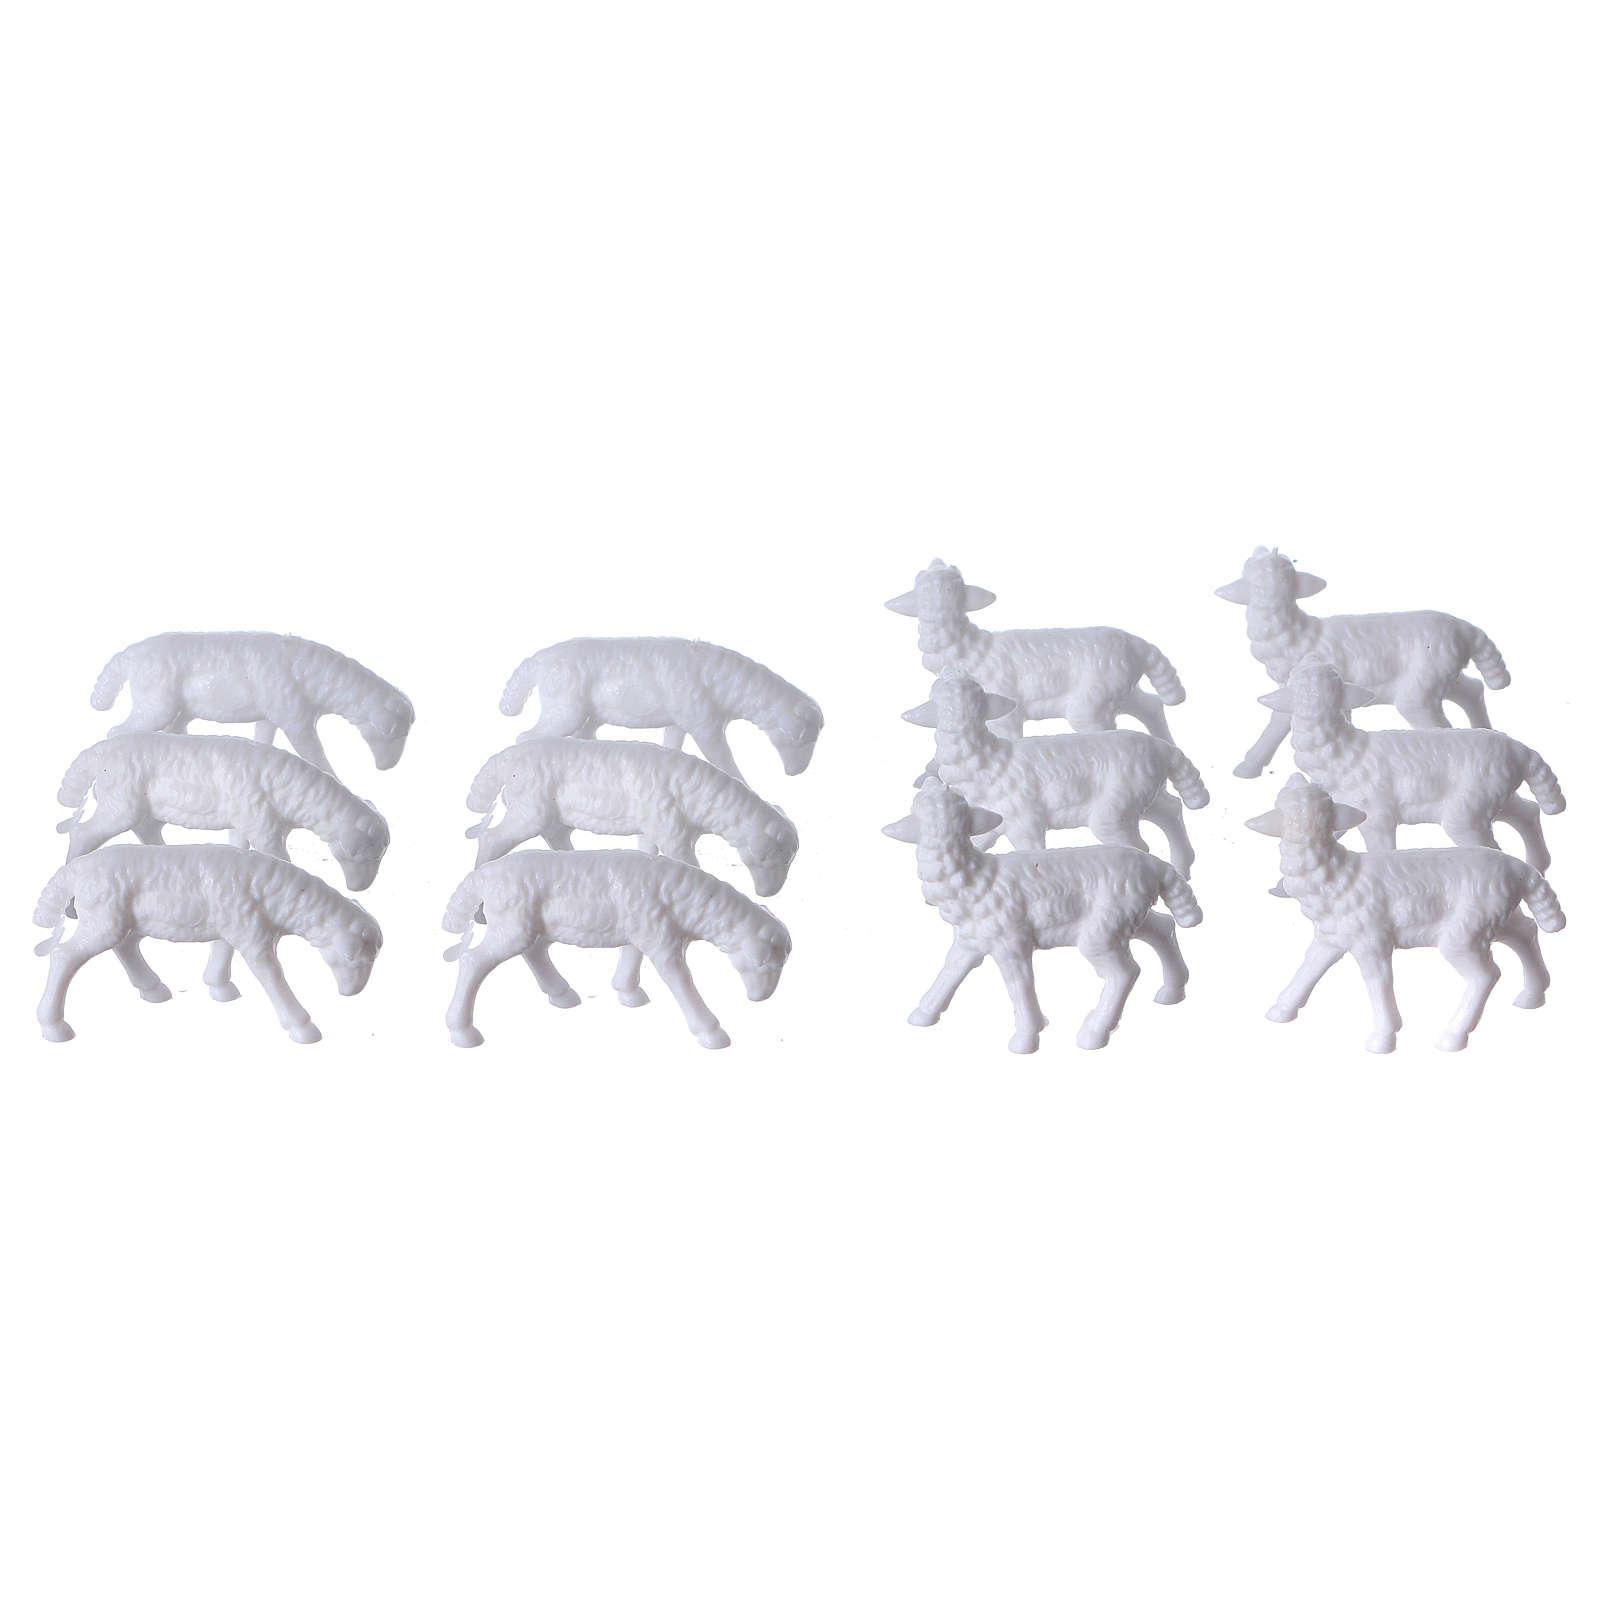 Nativity scene figurines, sheep 12 pieces 3